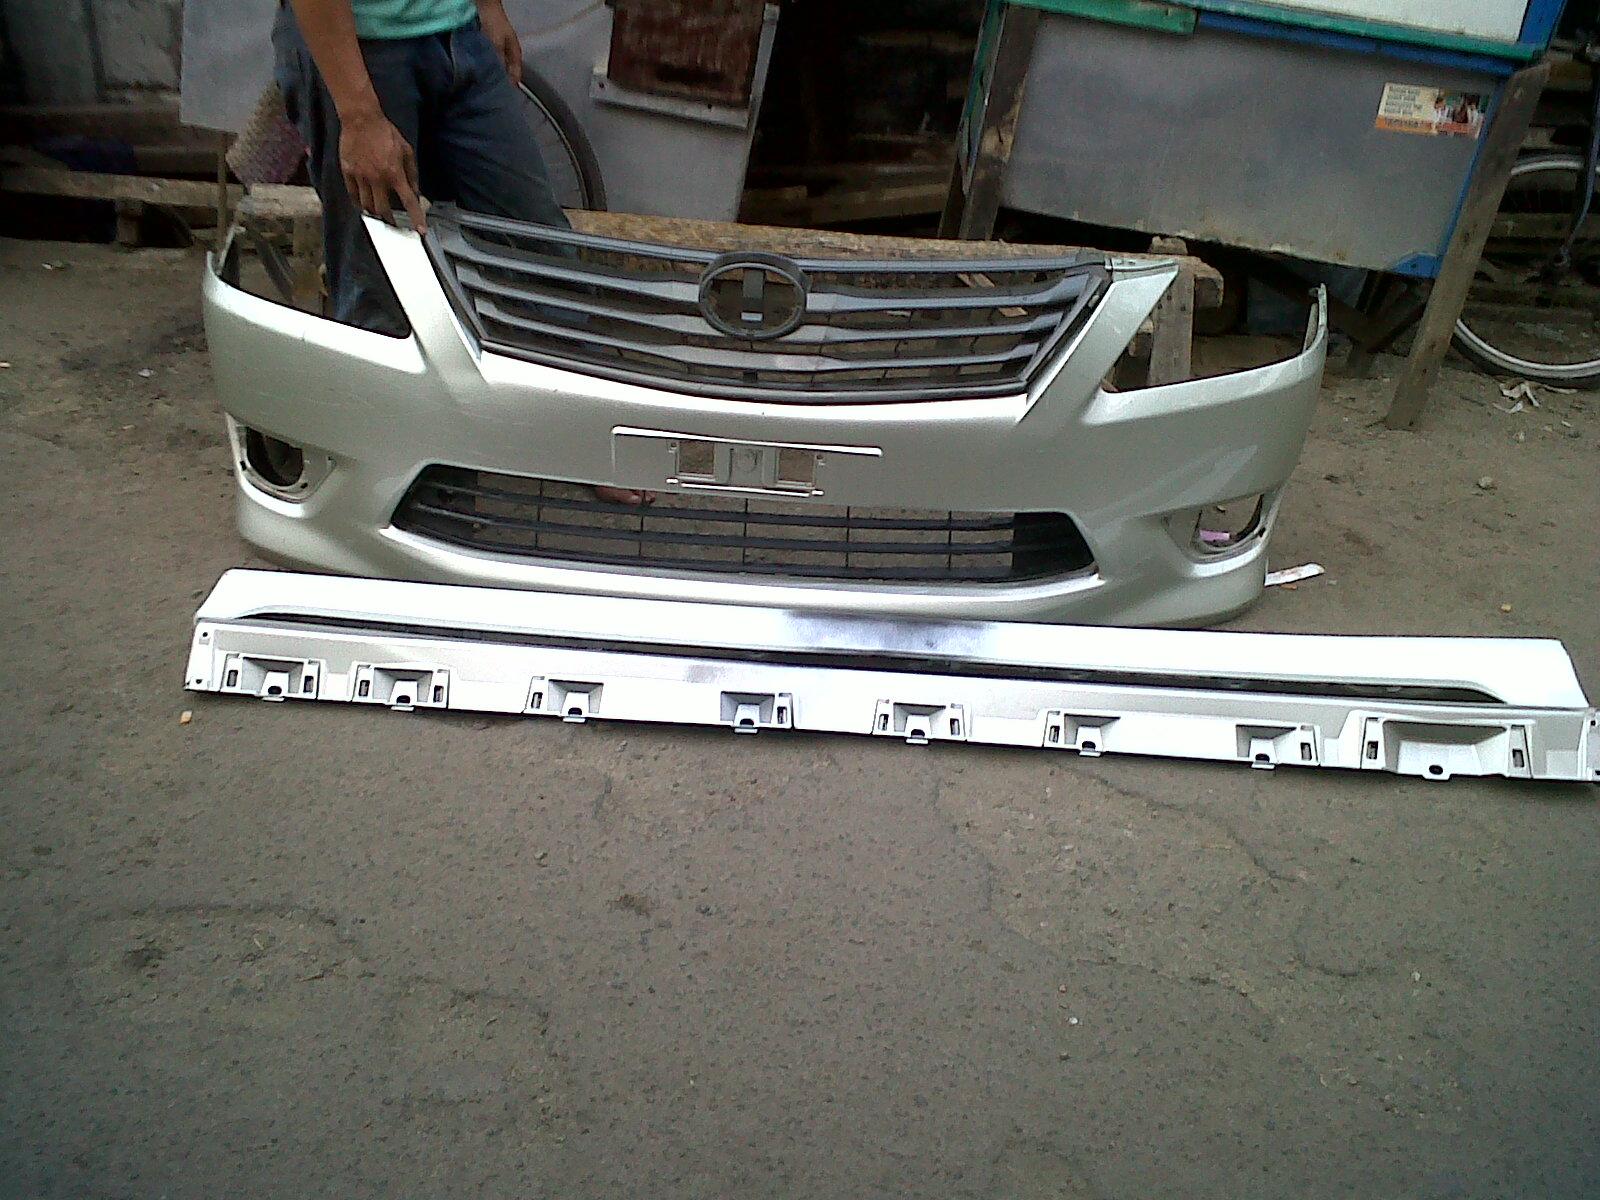 jual bodykit grand new avanza is the camry all wheel drive taruna motor 78 bemper copotan toyota